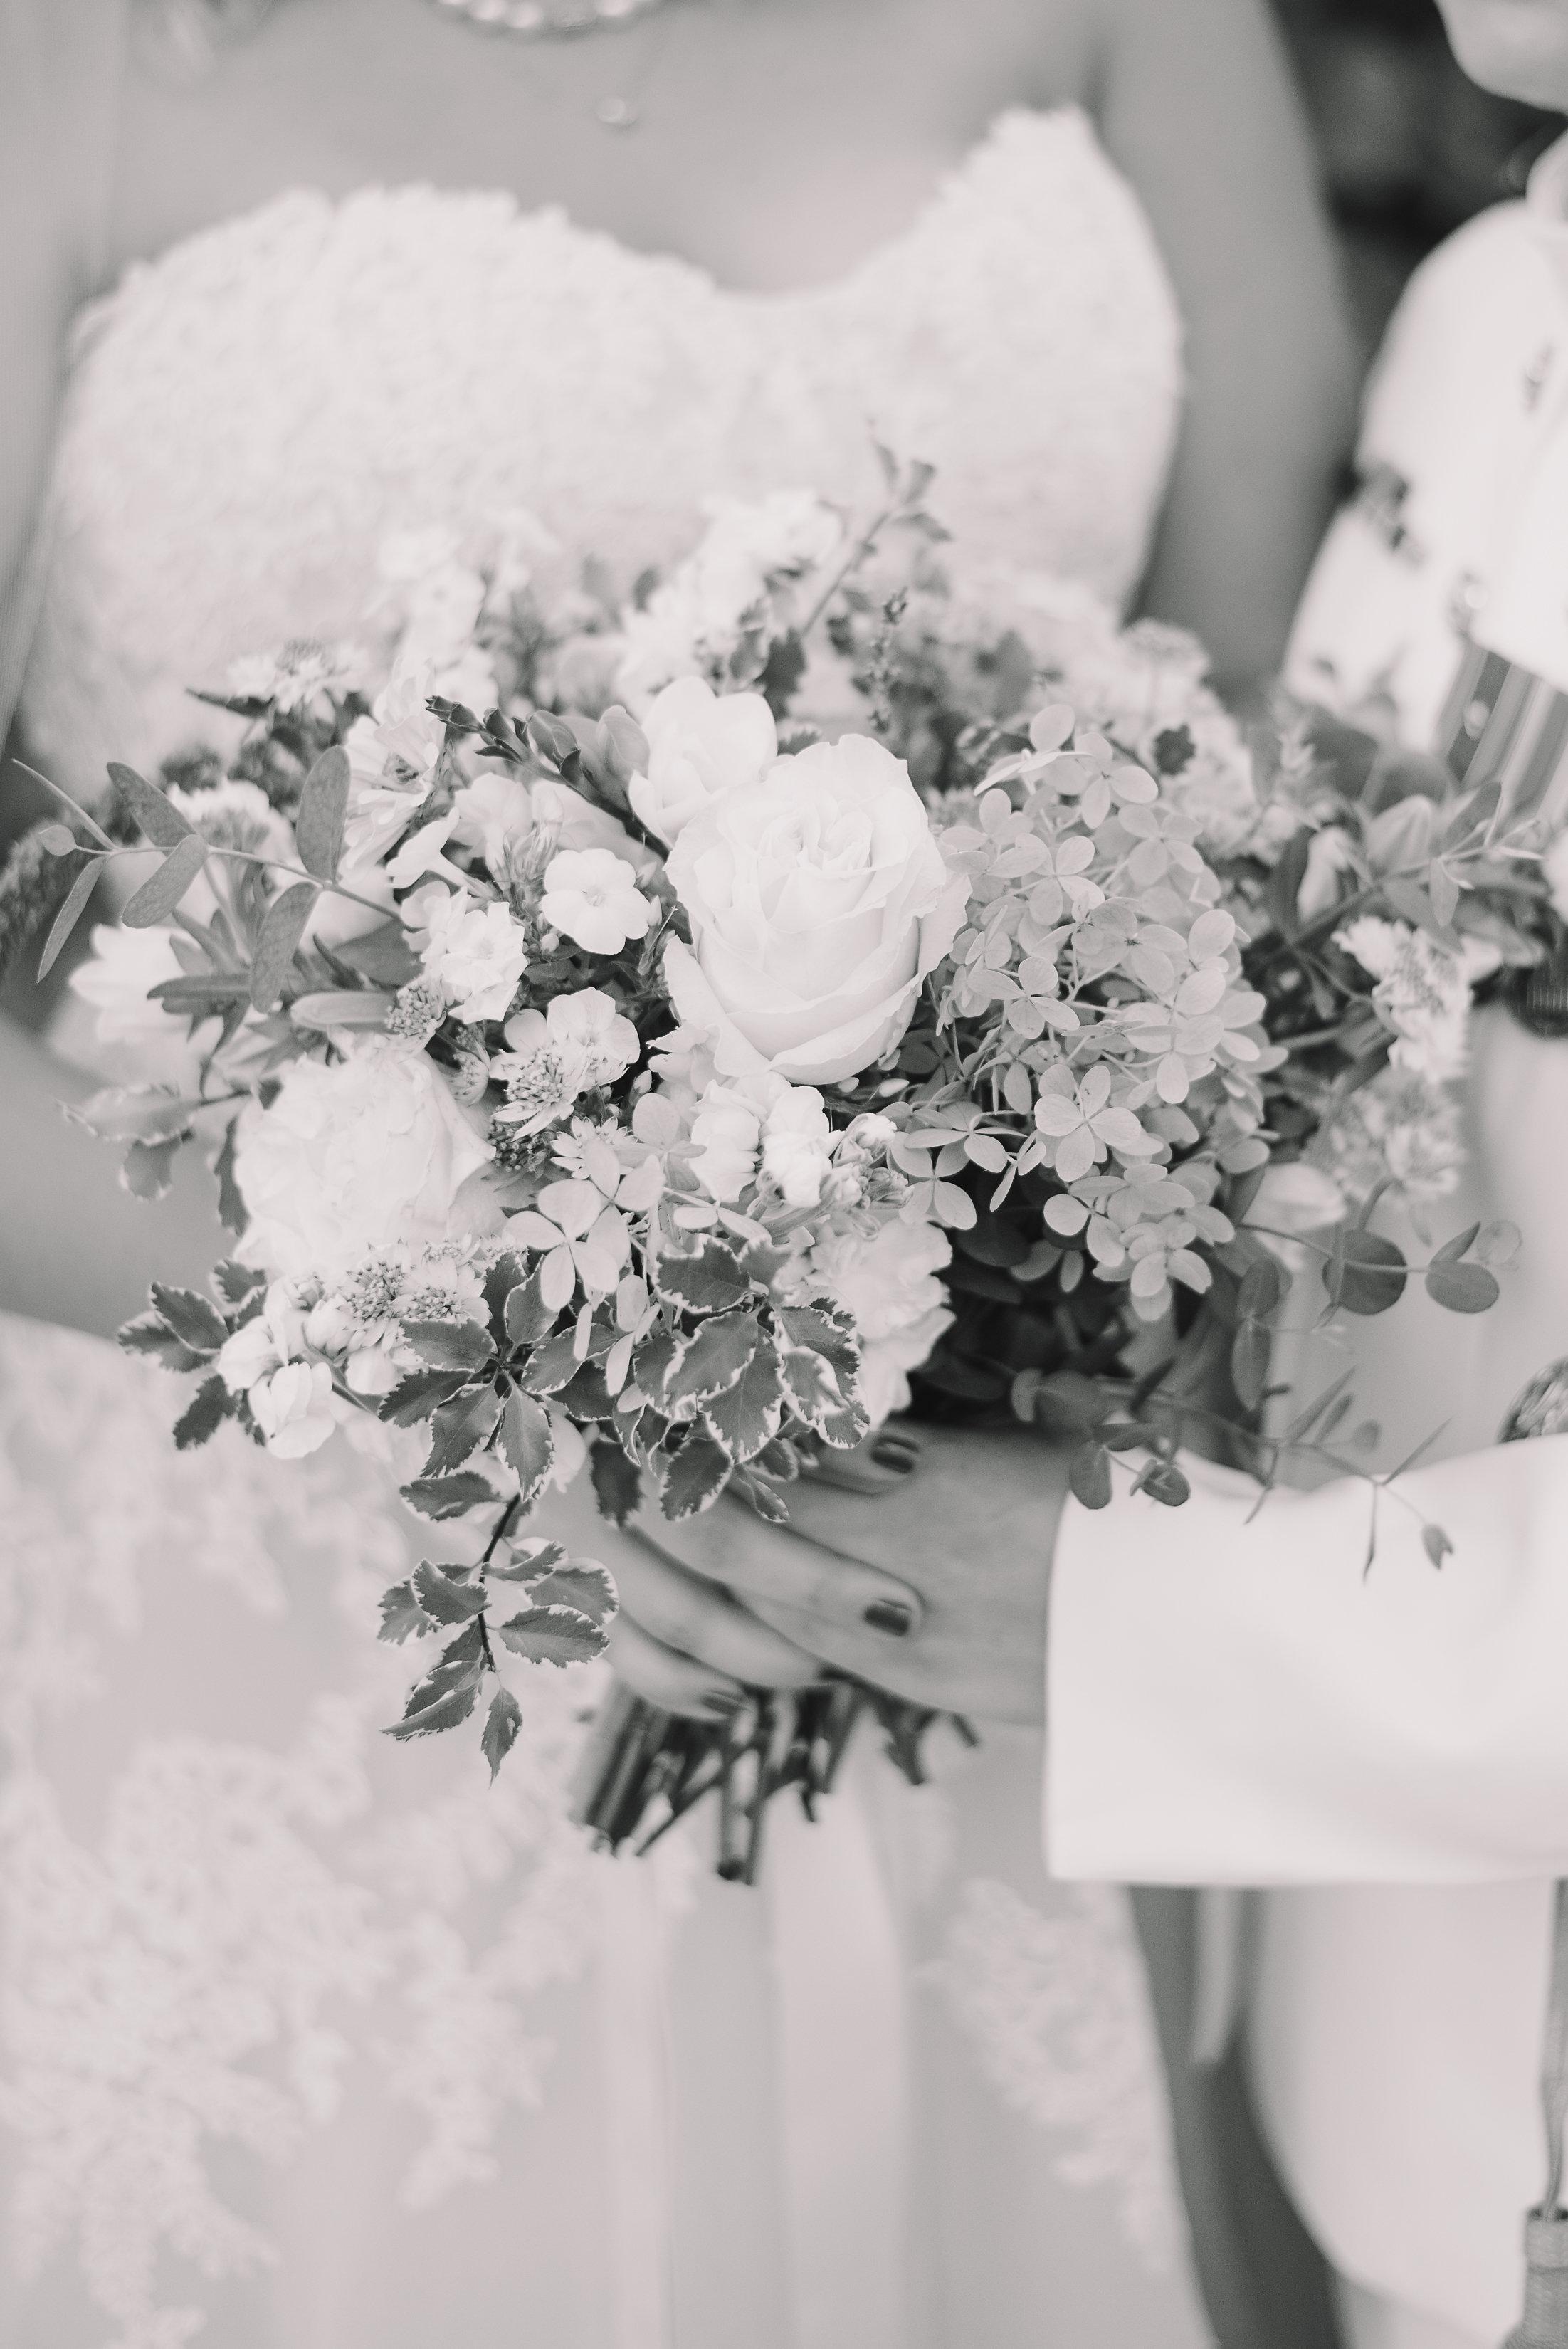 NormanPhotoPaper_SuttonSimila_Wedding-467.jpg